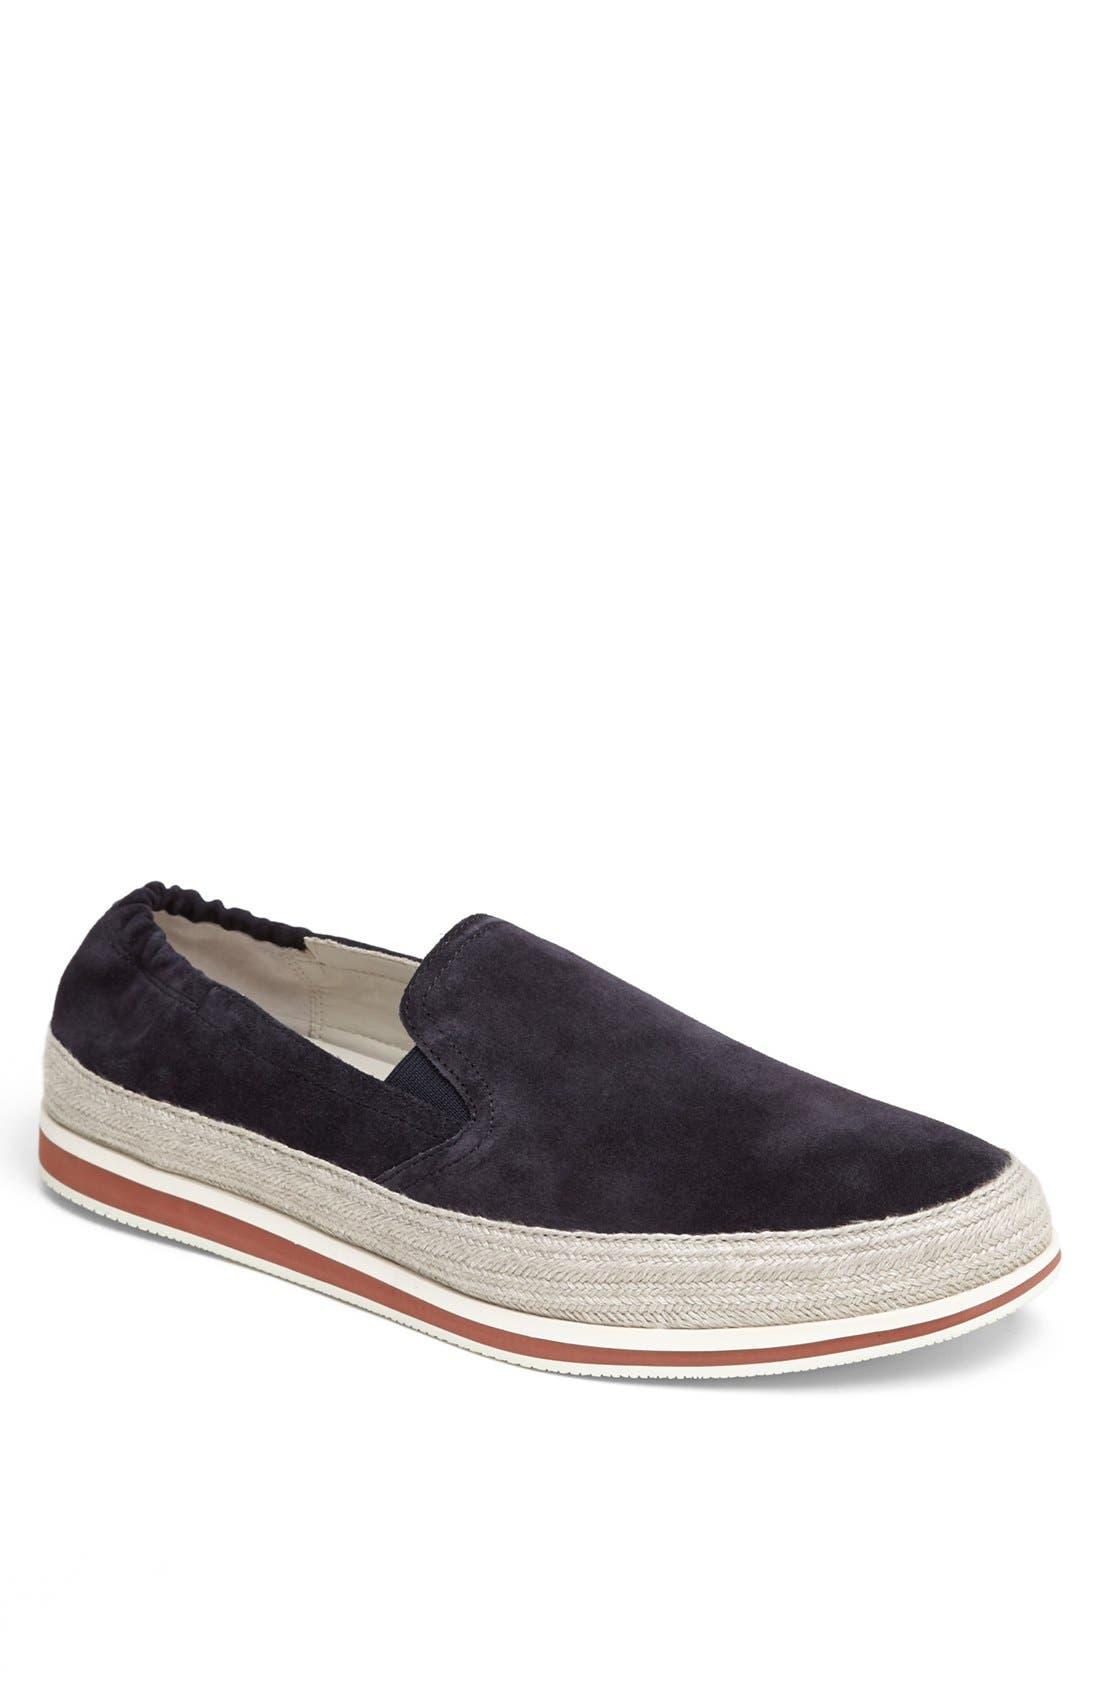 Espadrille Sneaker,                         Main,                         color, Blue Suede